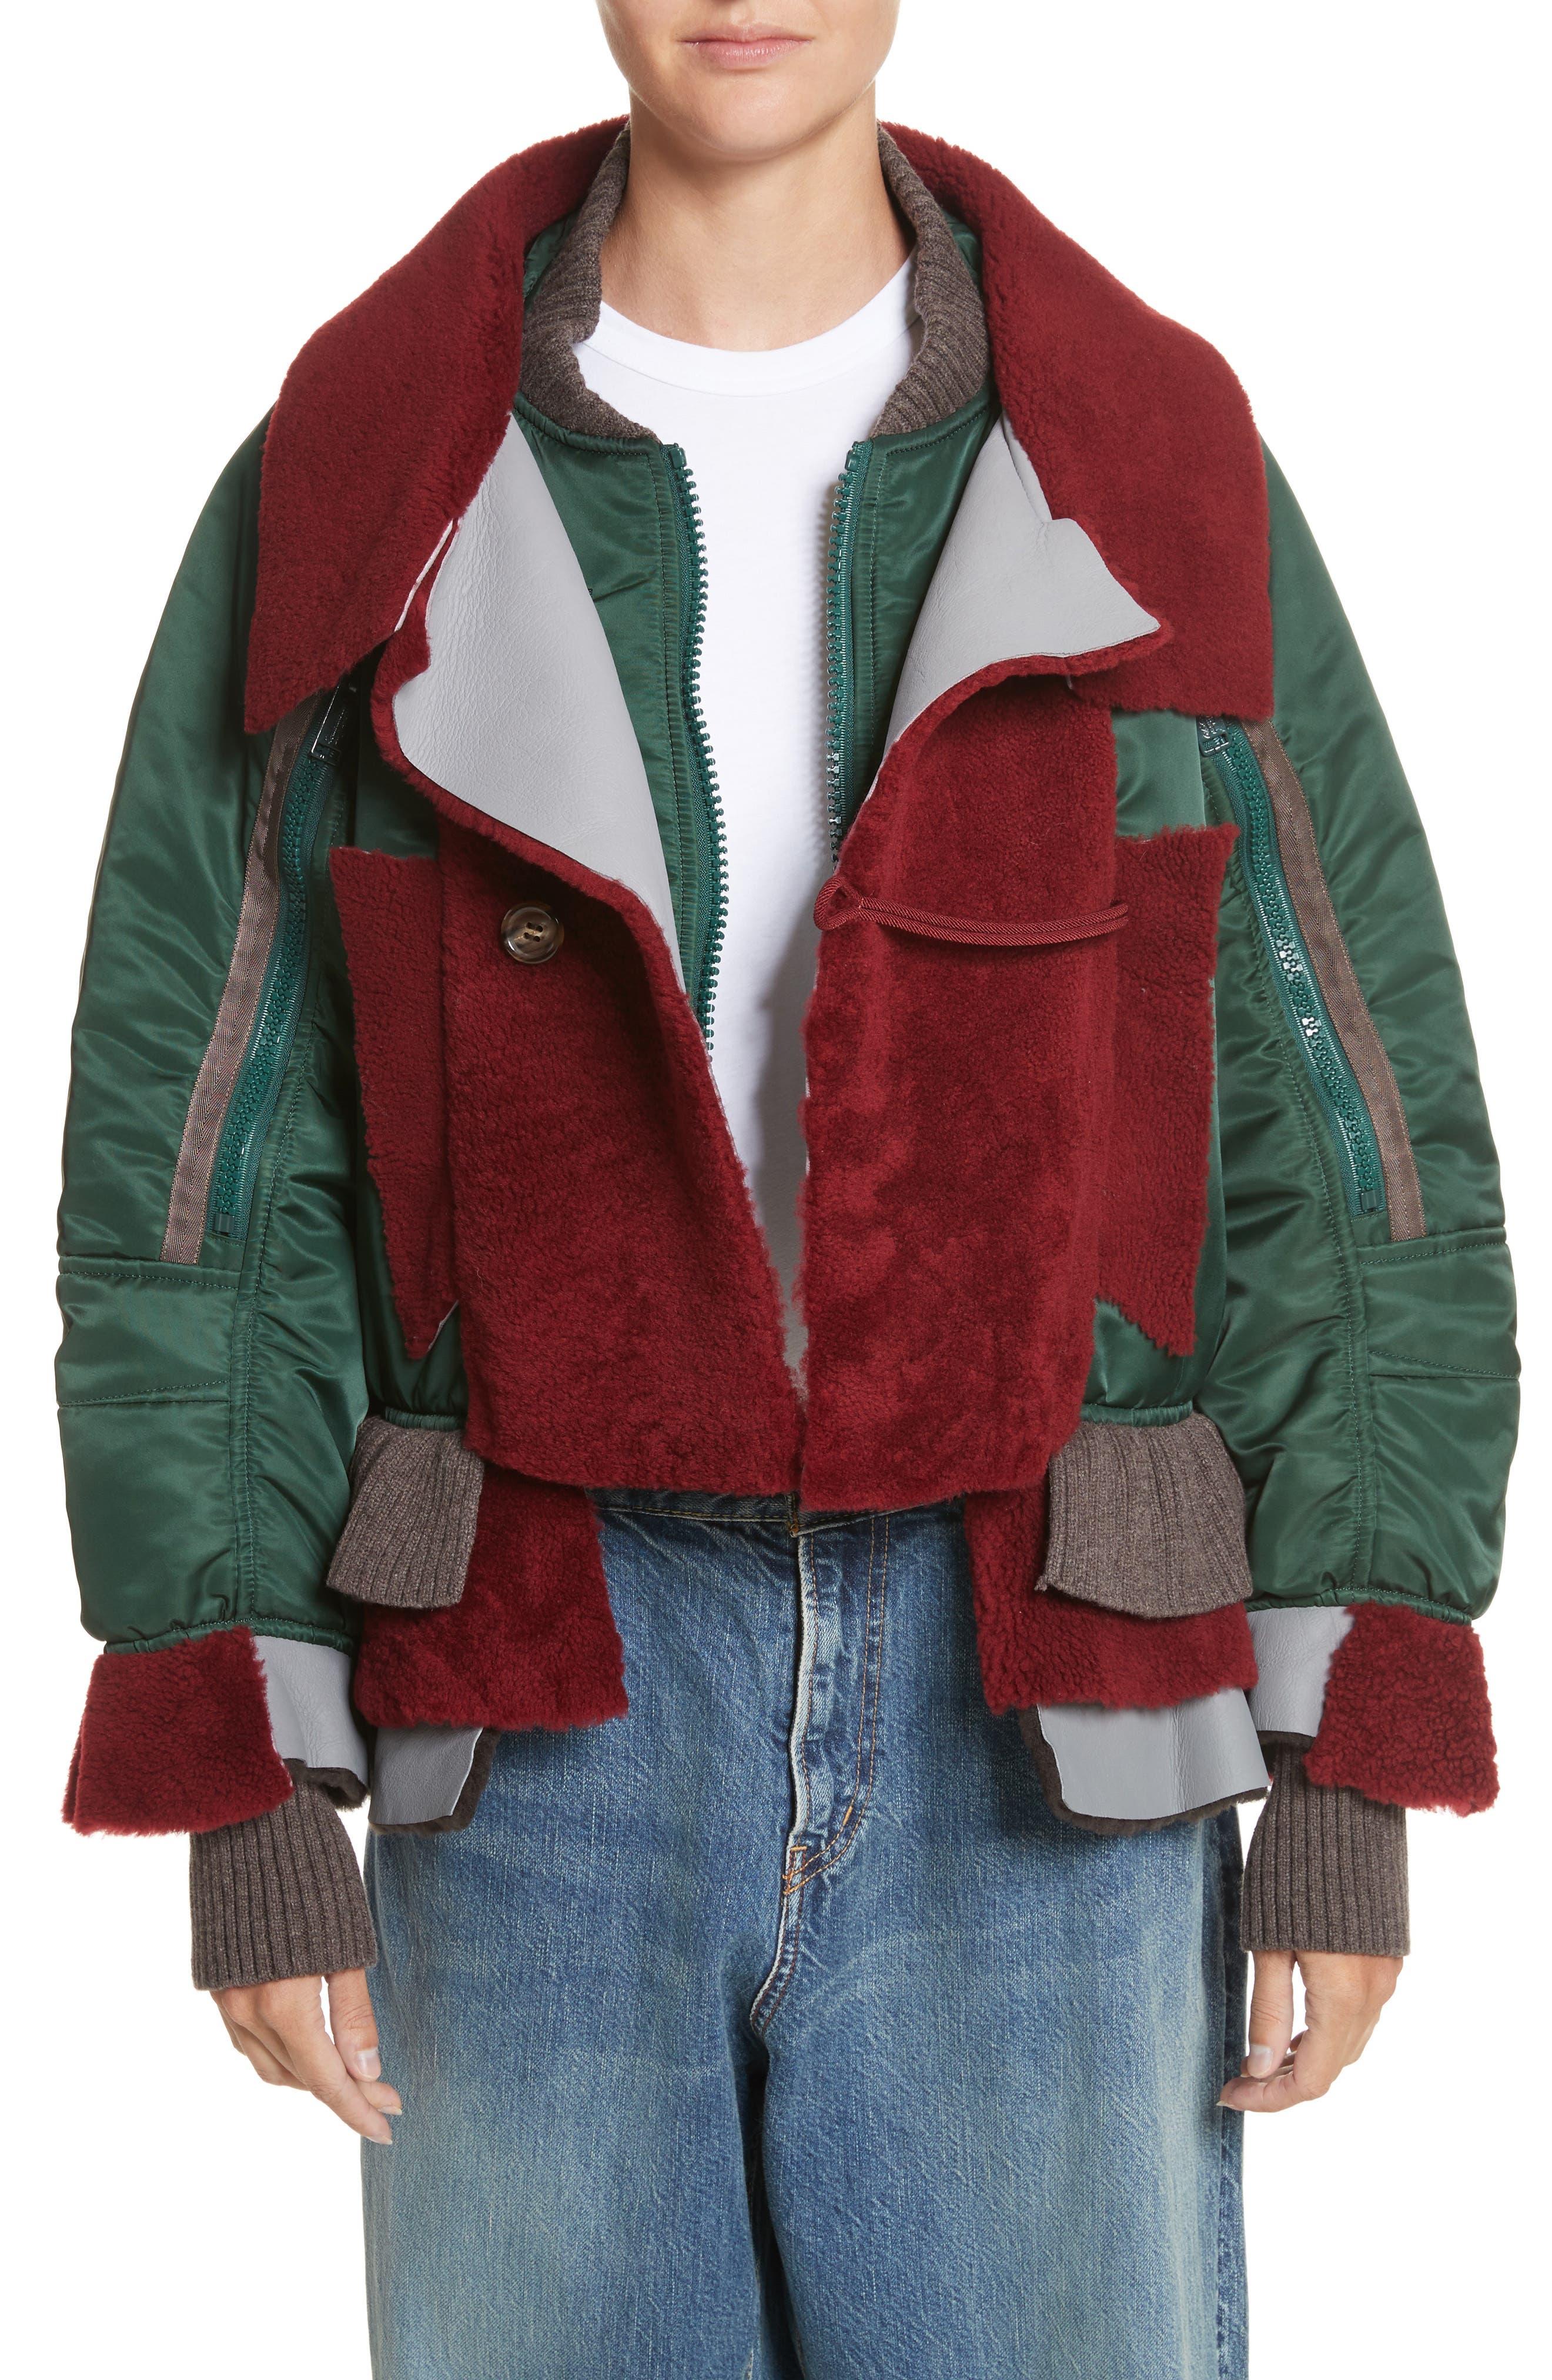 Mixed Media Bomber Jacket with Genuine Shearling Trim,                         Main,                         color, Khaki